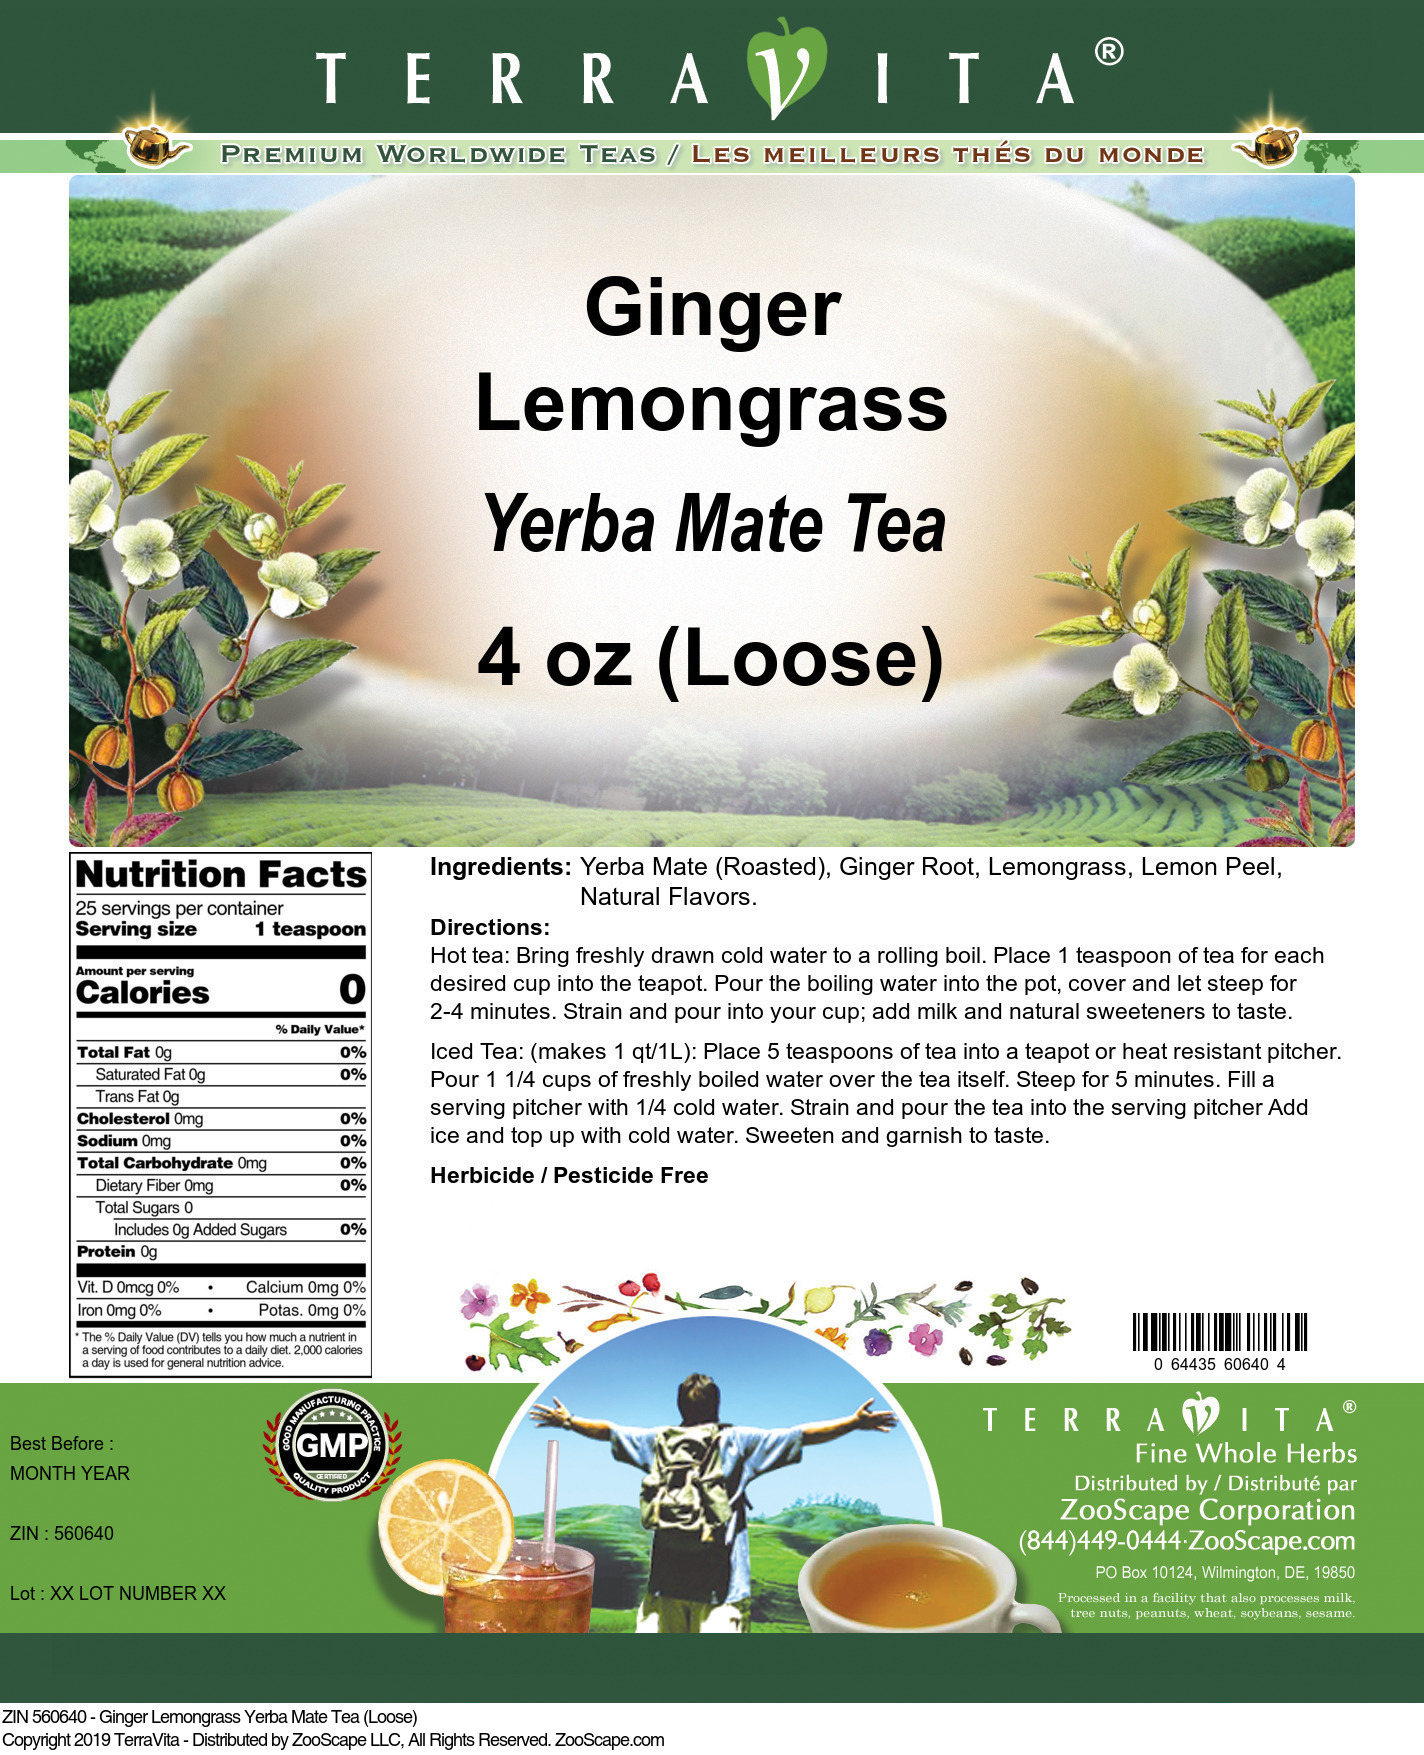 Ginger Lemongrass Yerba Mate Tea (Loose)